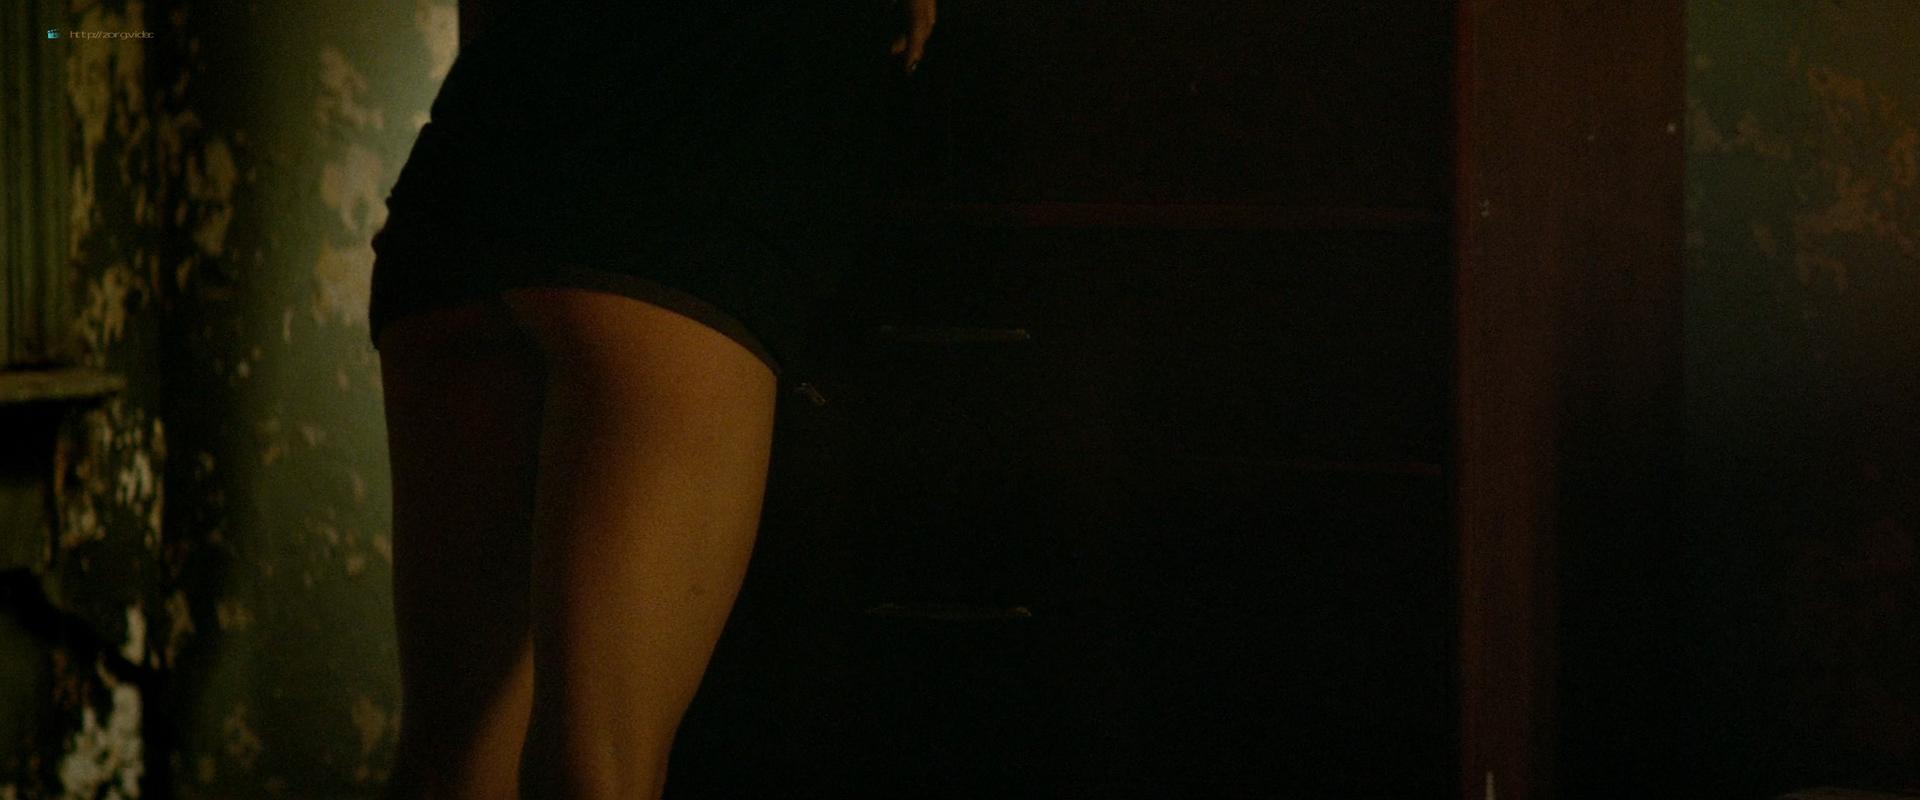 Karla Souza nude hot sex - Jacob's Ladder (2019) HD 1080p (8)